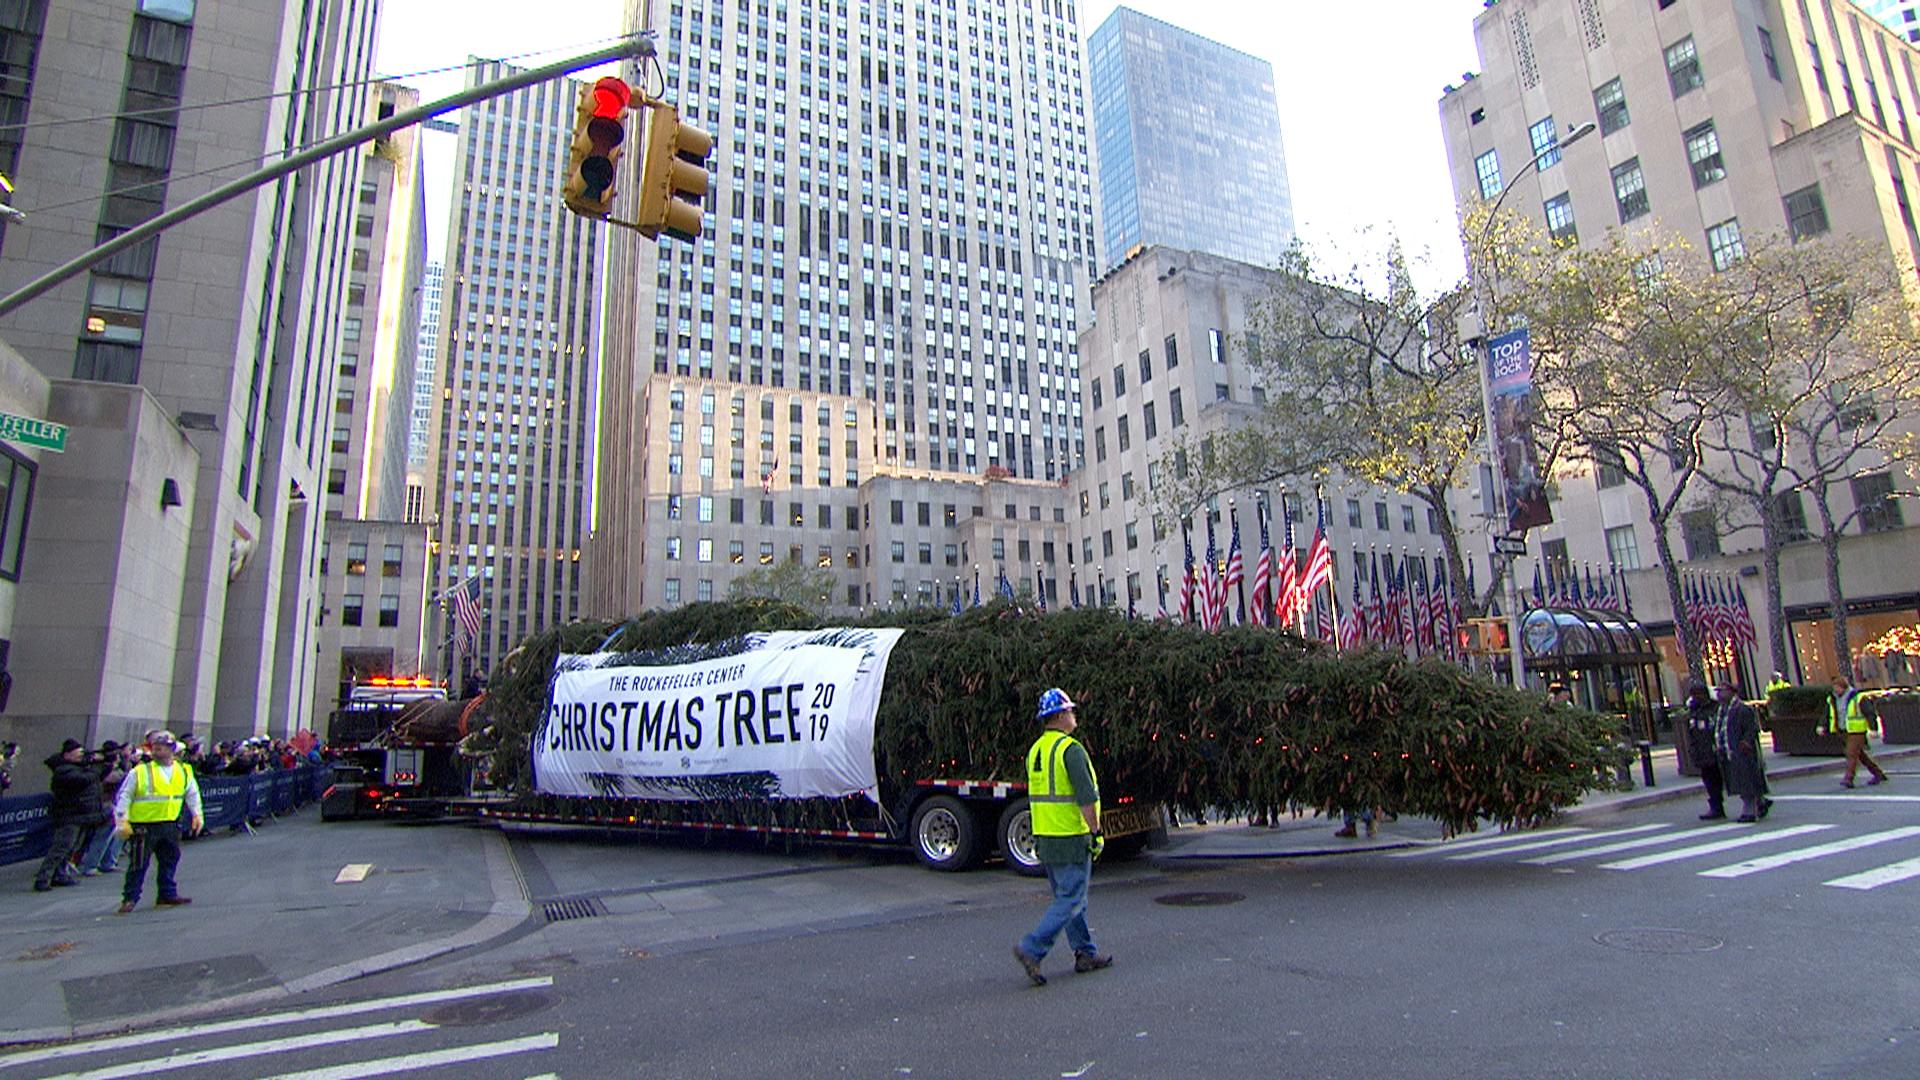 Flipboard: Meet the new 2019 Rockefeller Center Christmas tree